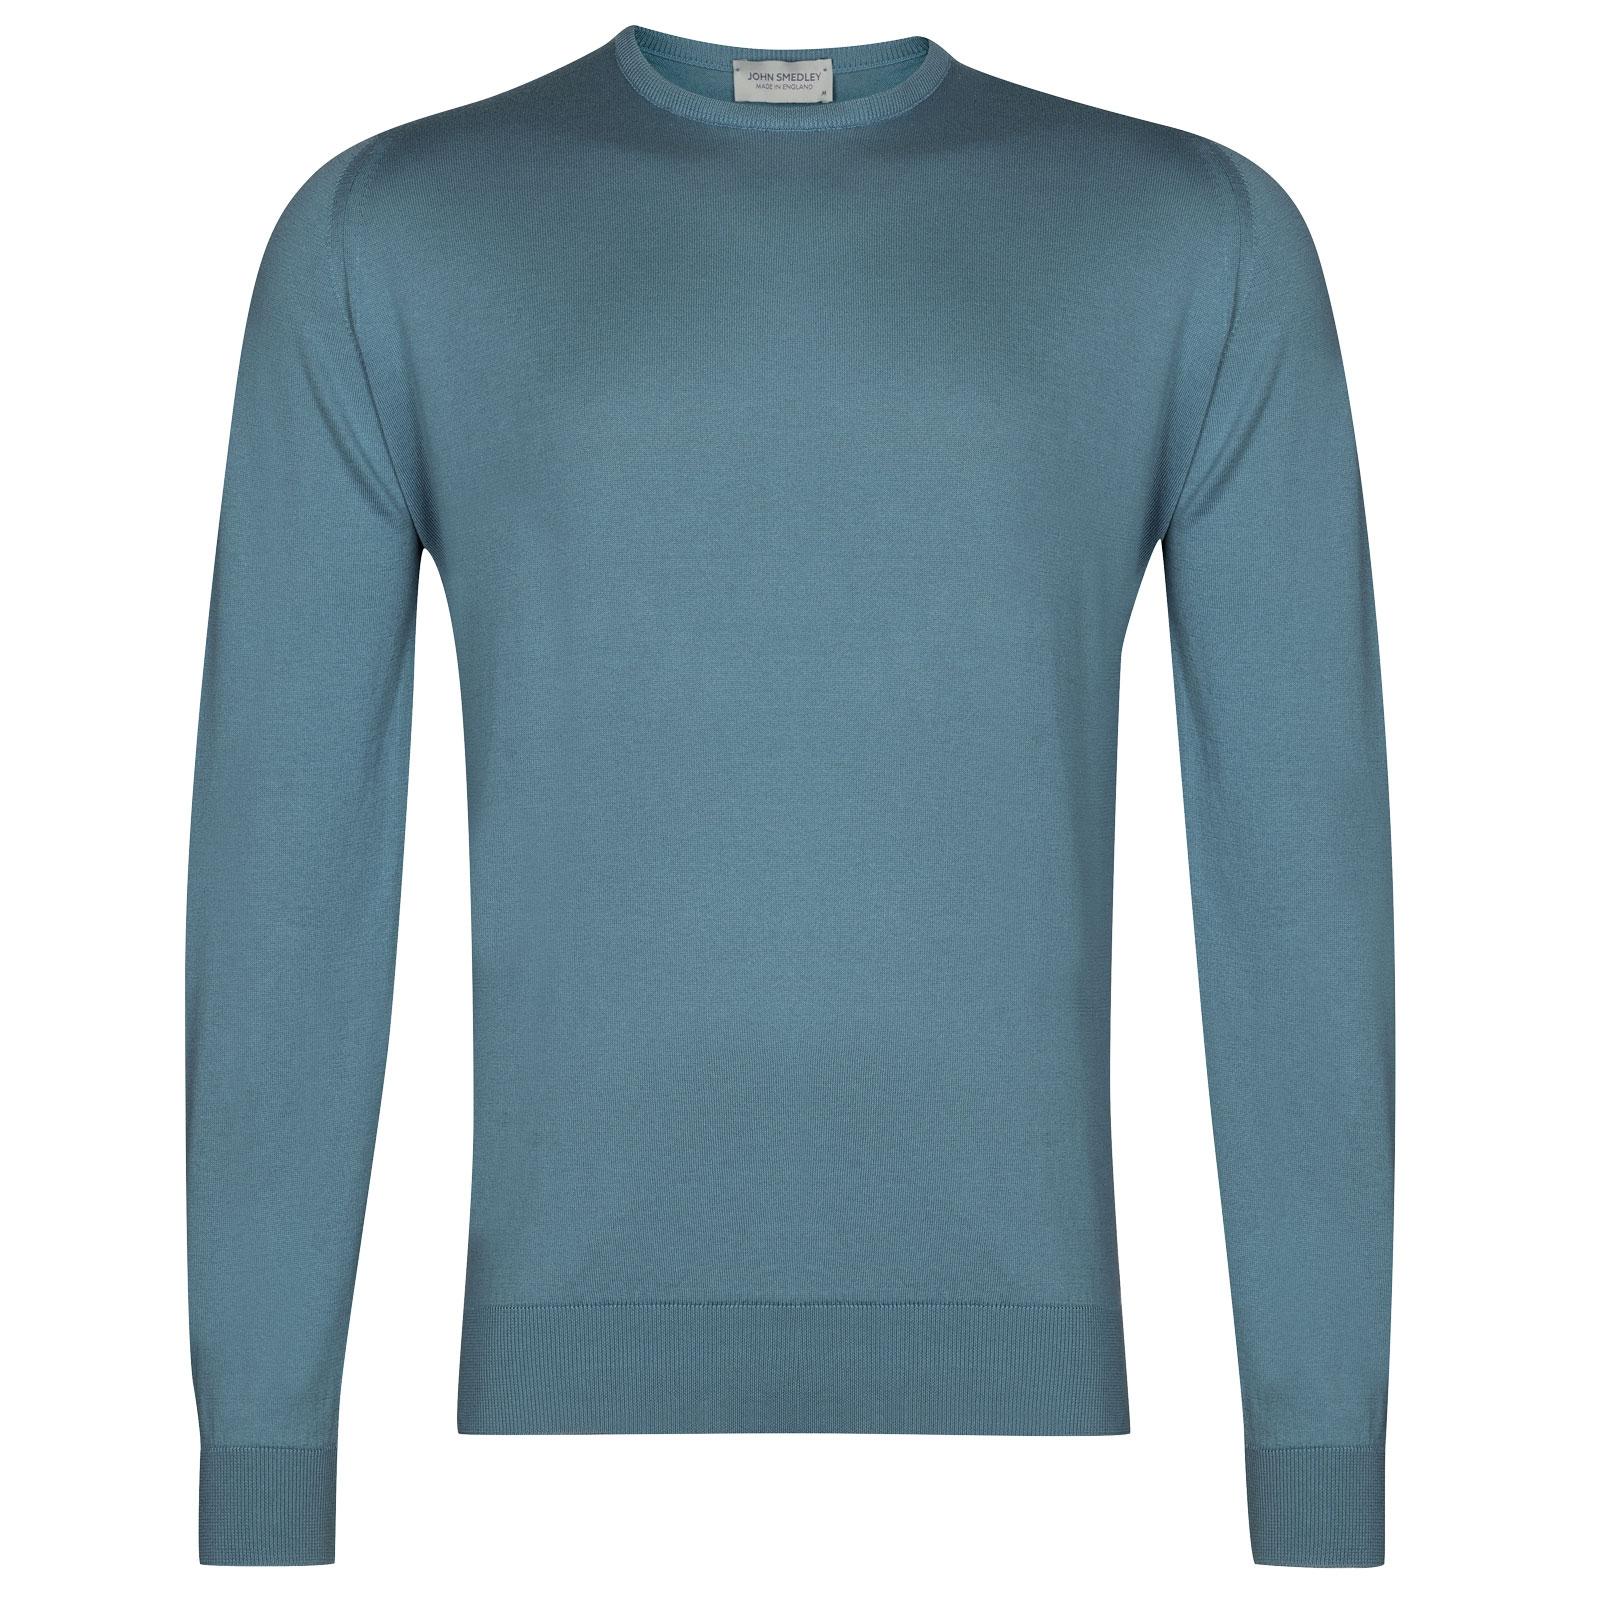 John Smedley Hatfield in Dewdrop Blue Pullover-LGE